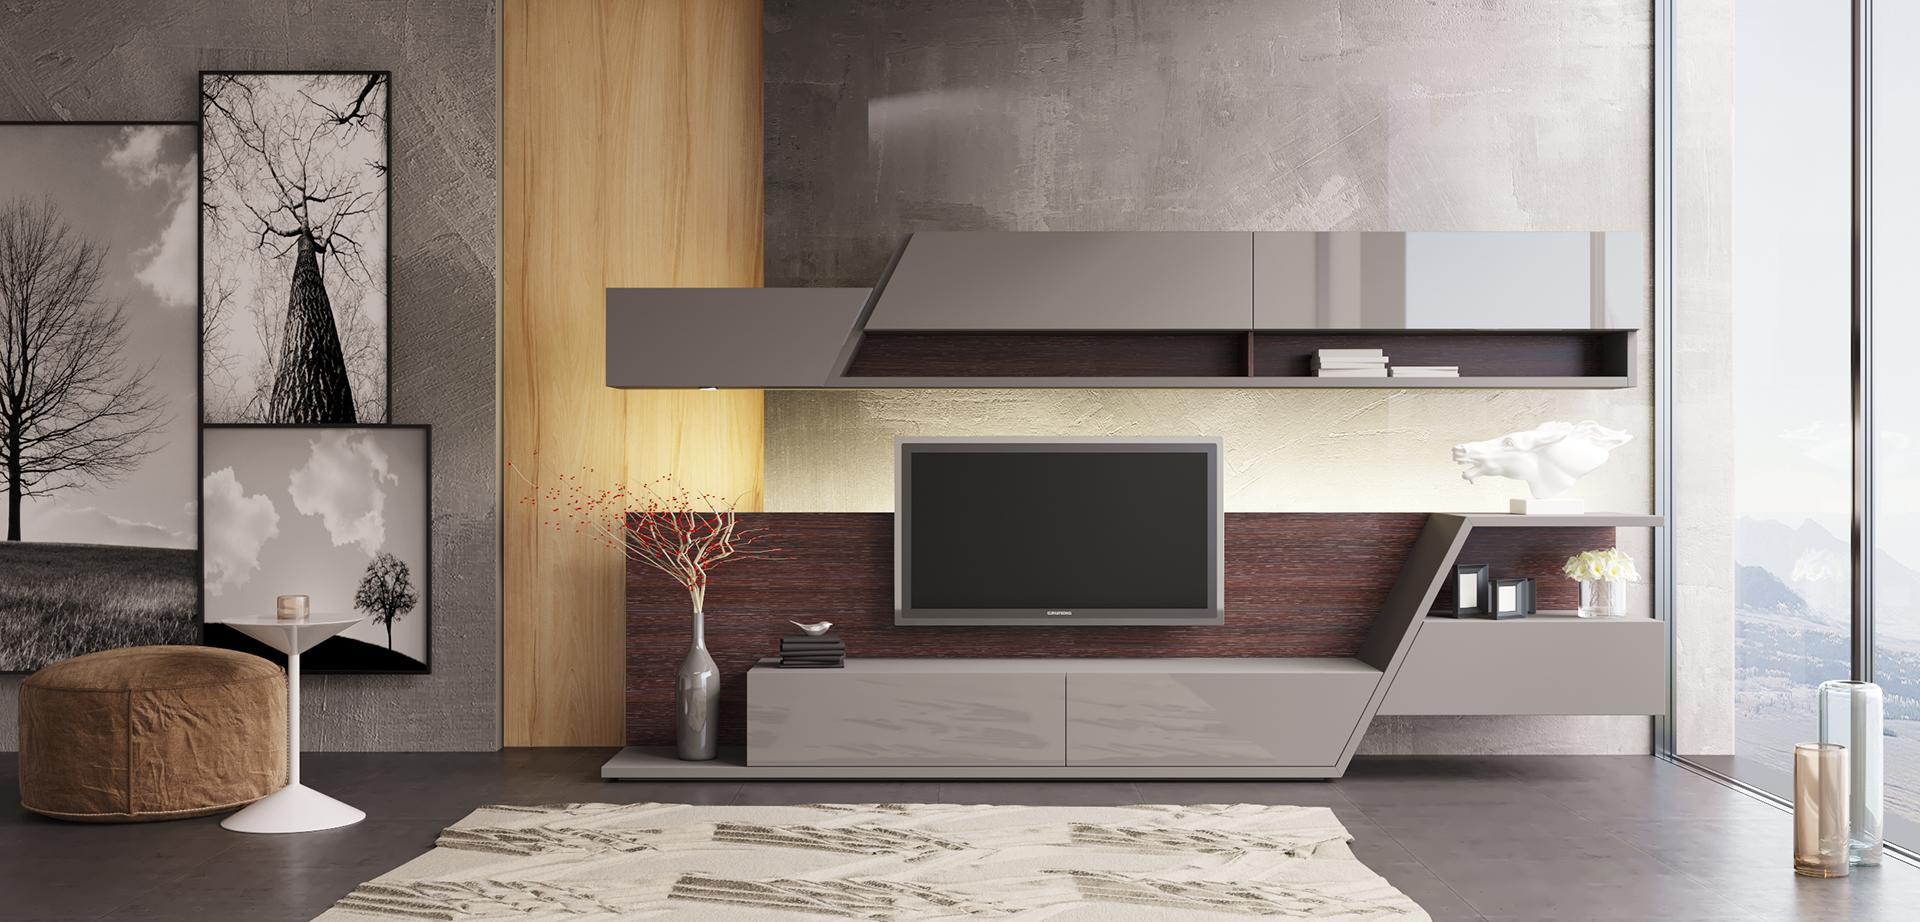 Göreme TV-Geräte